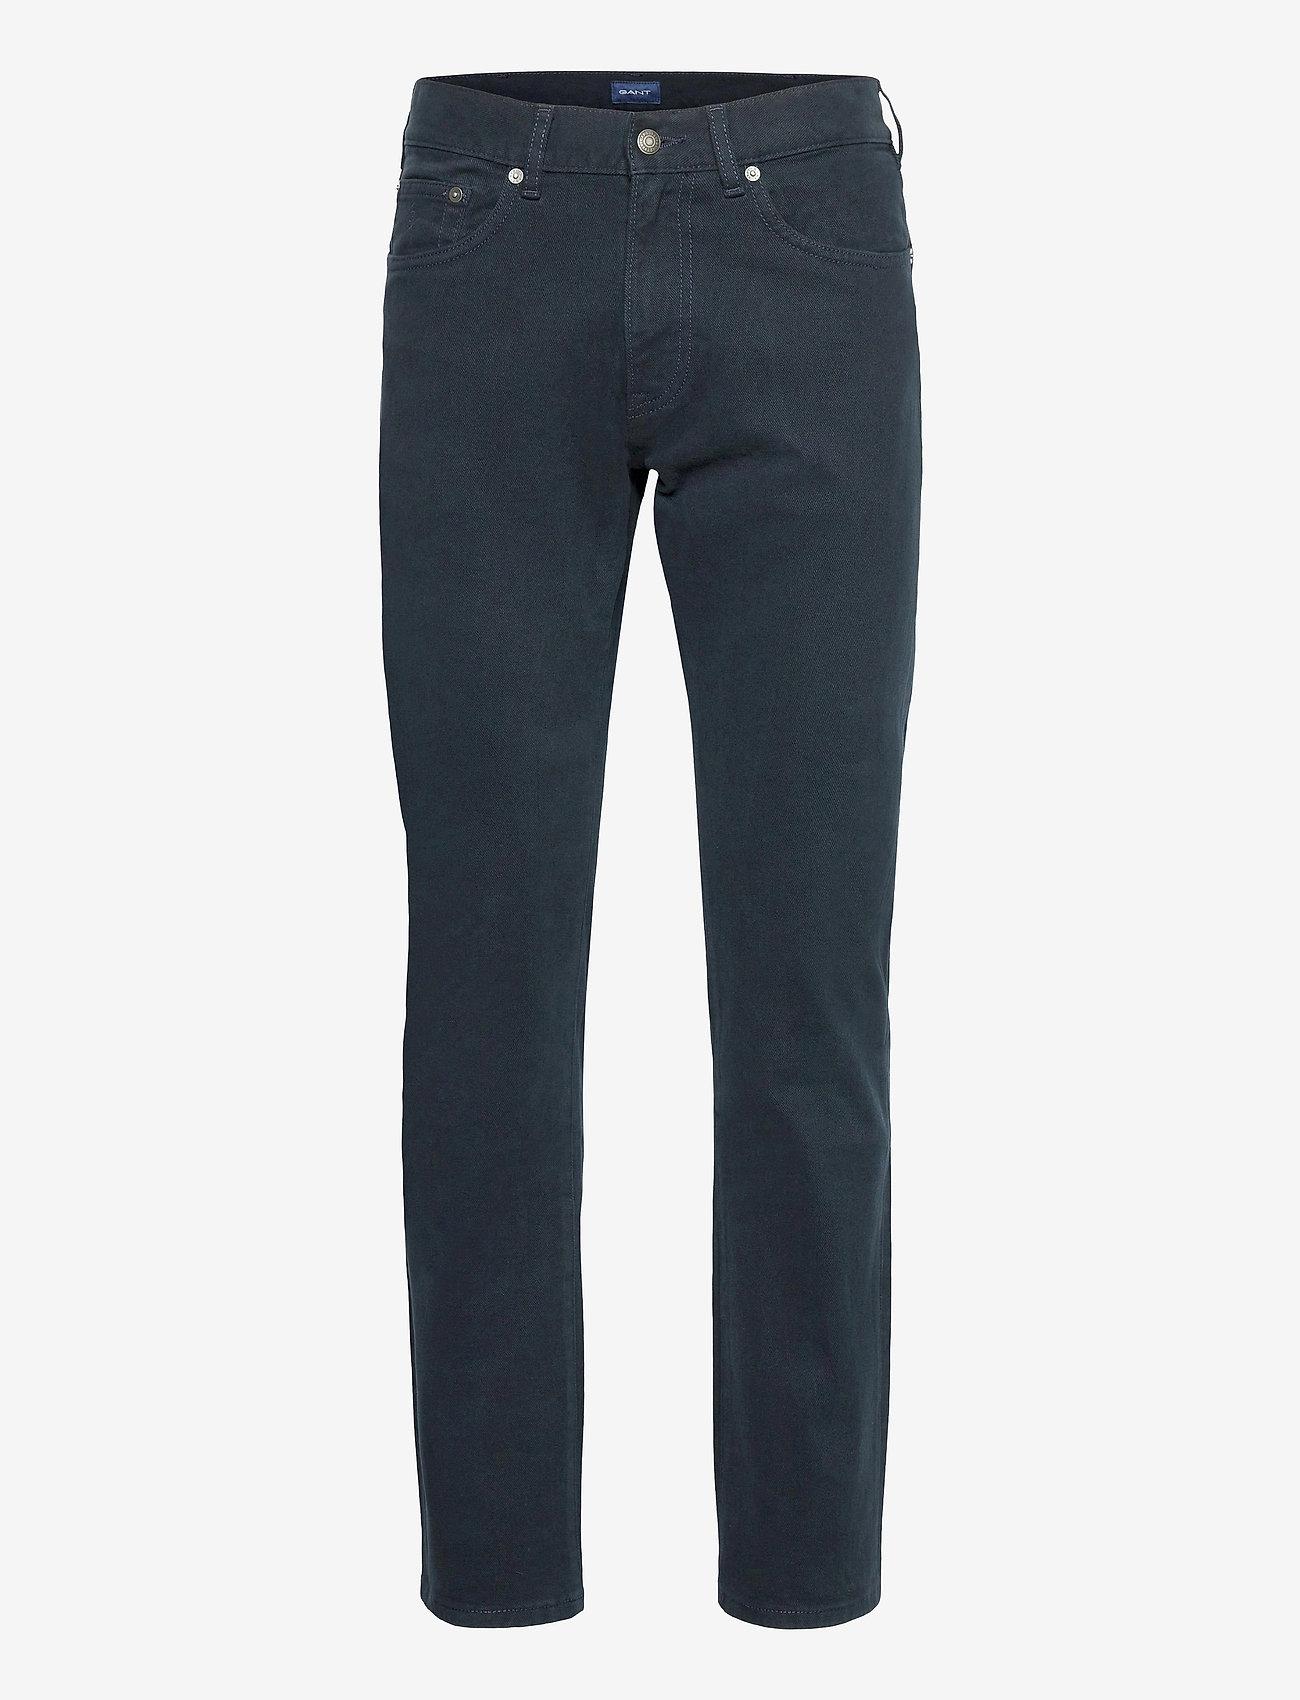 GANT - D2. REGULAR SOFT TWILL JEANS - regular jeans - navy - 0